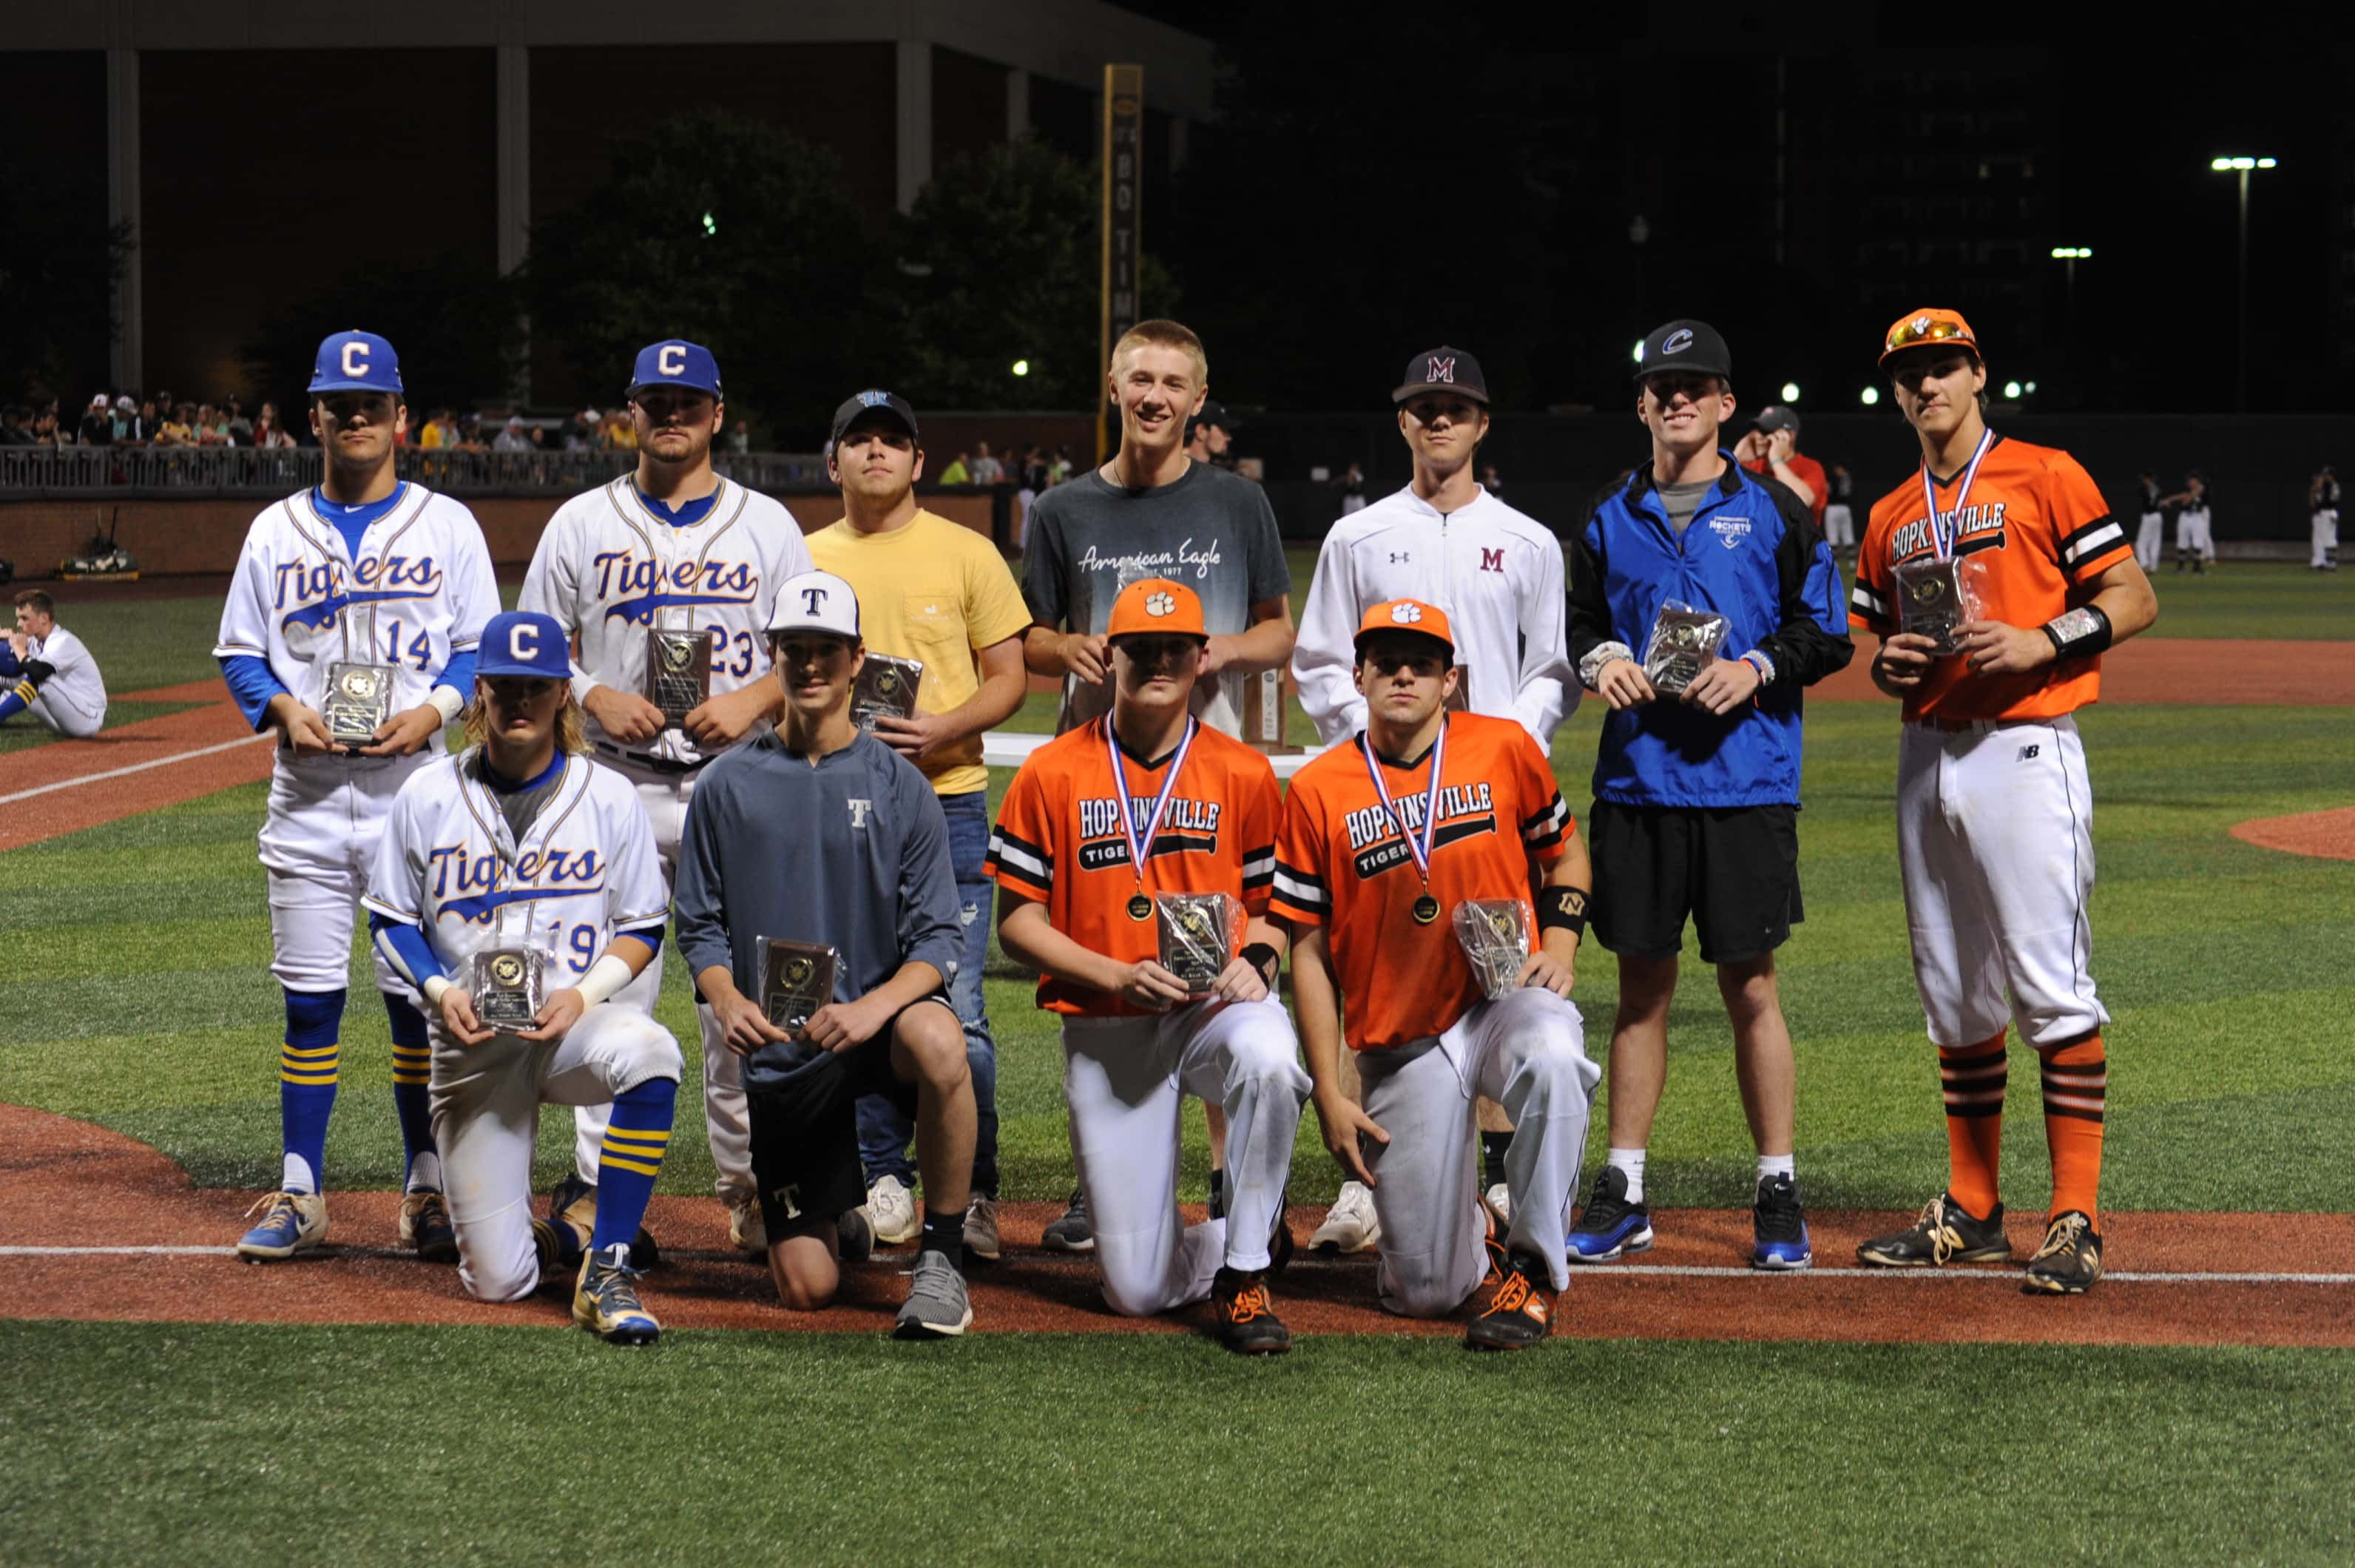 PHOTOS – All-2nd Region Baseball Team